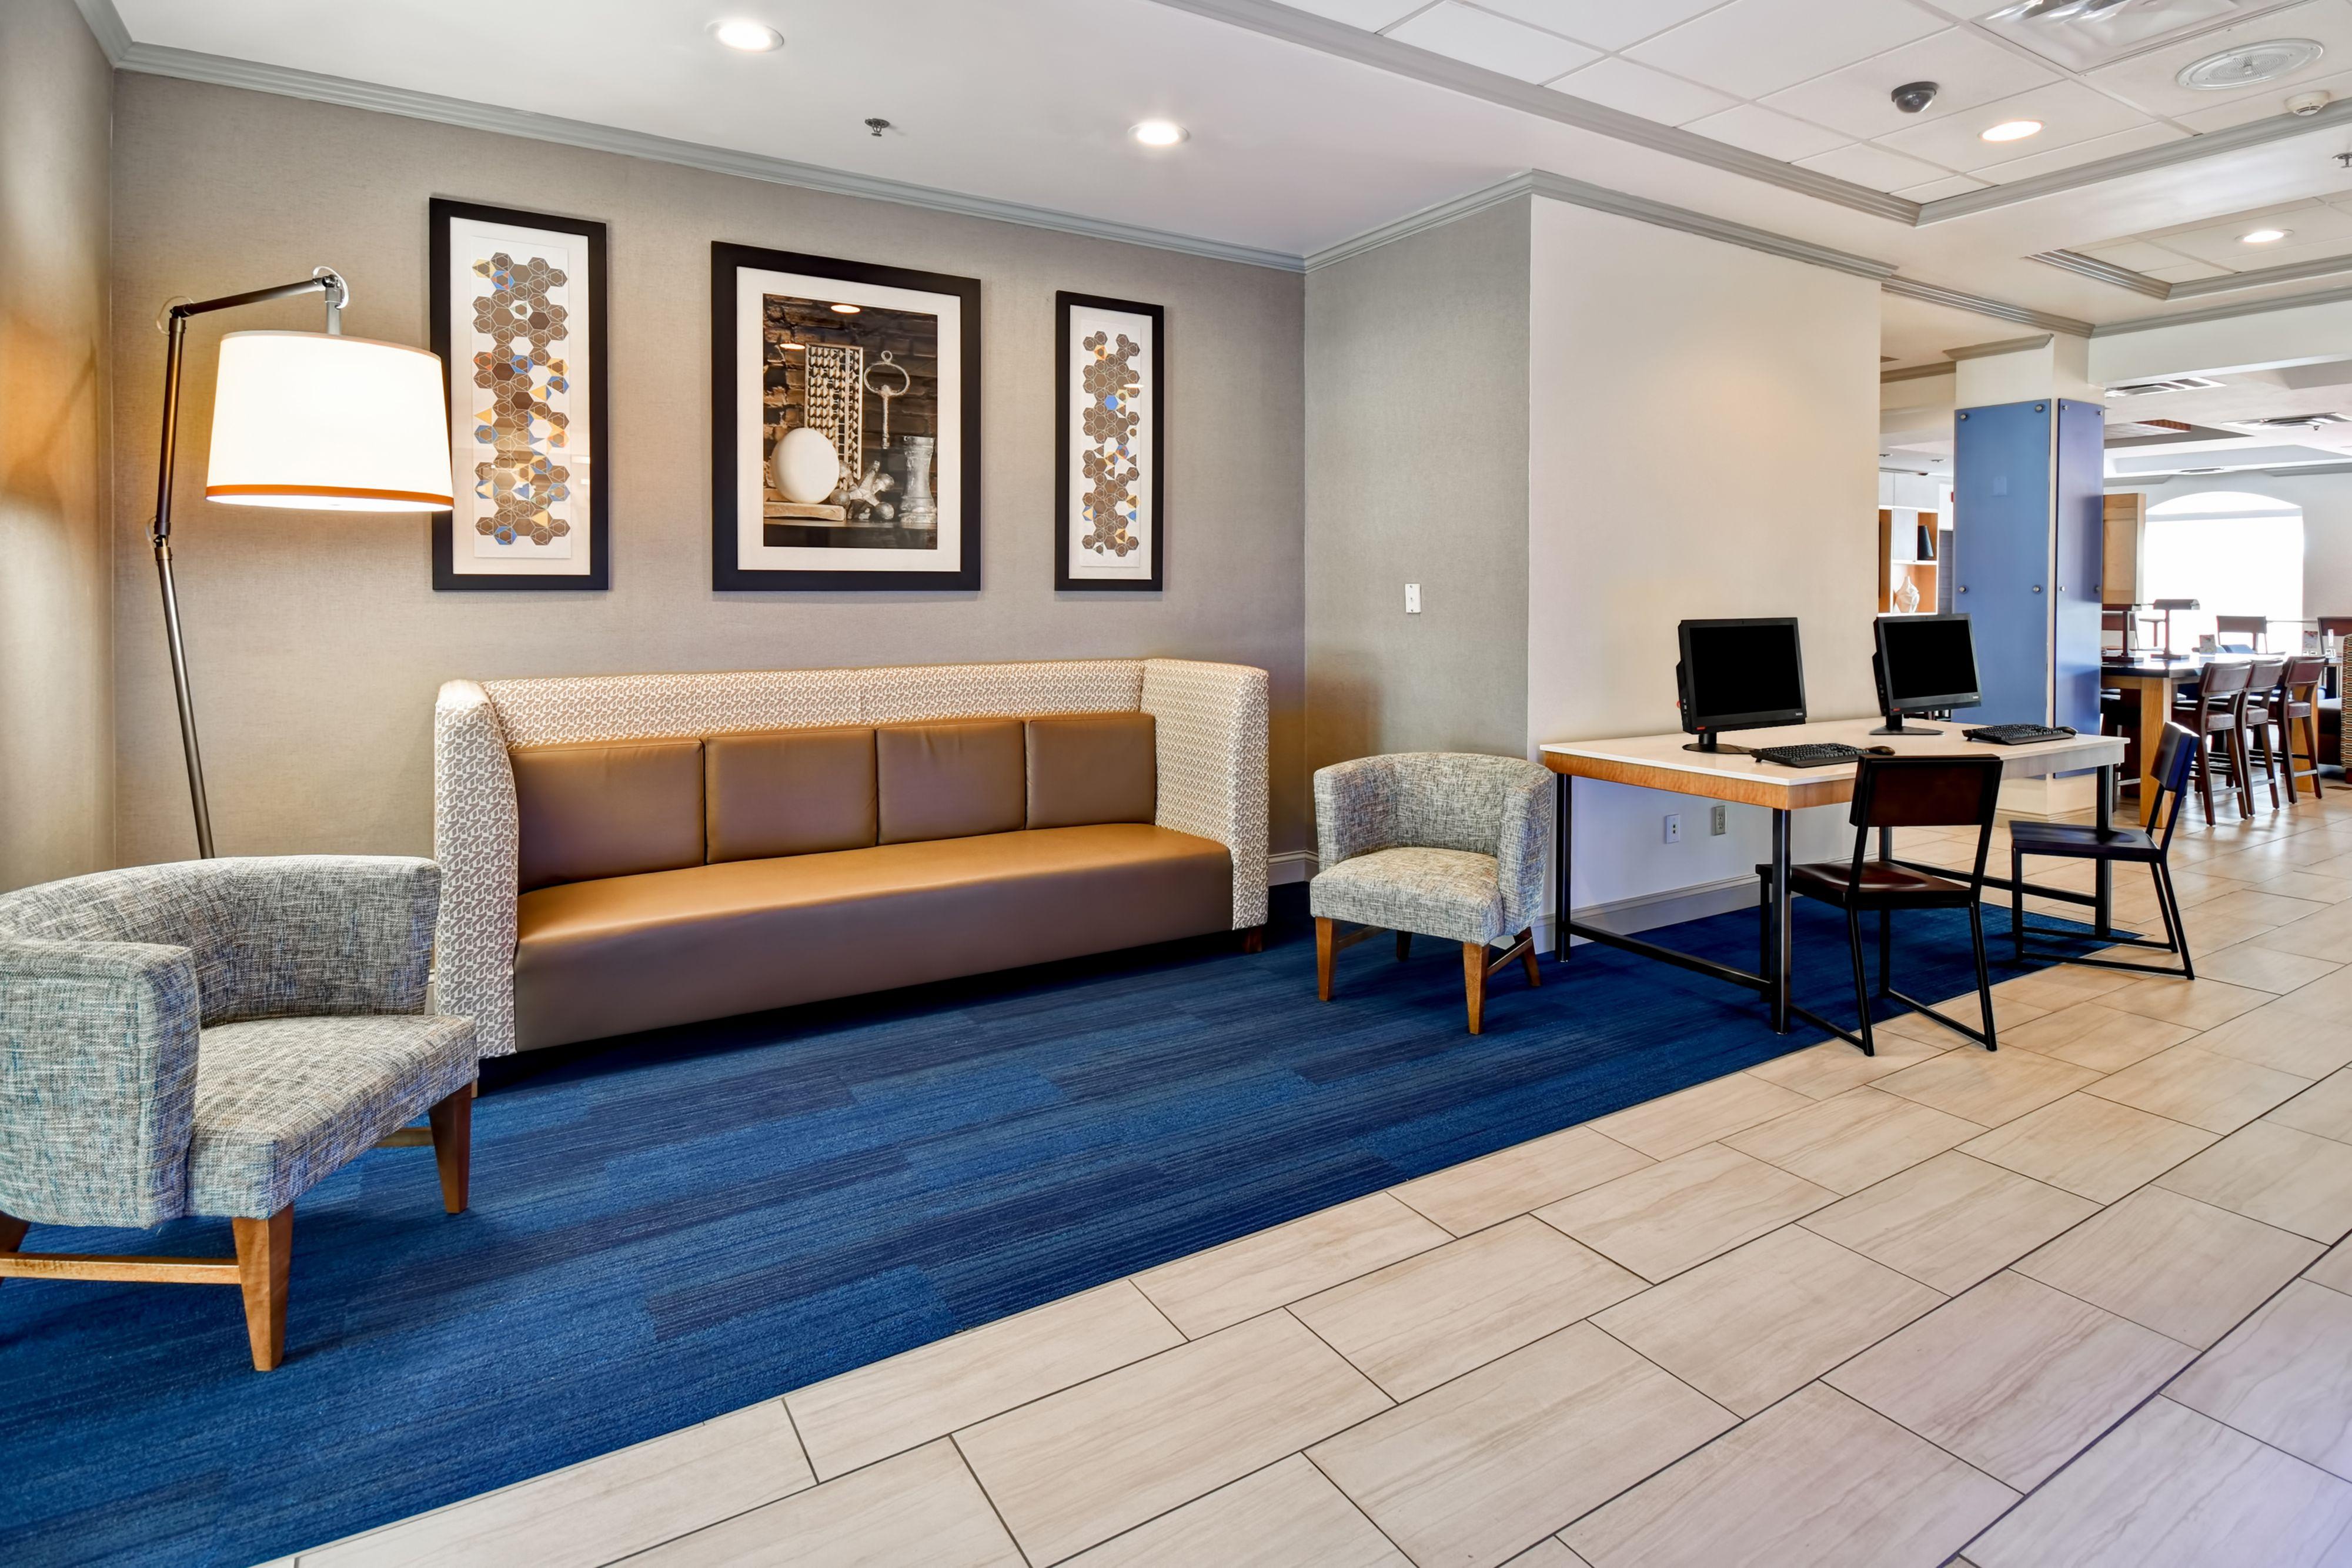 Holiday Inn Express & Suites Schererville image 10